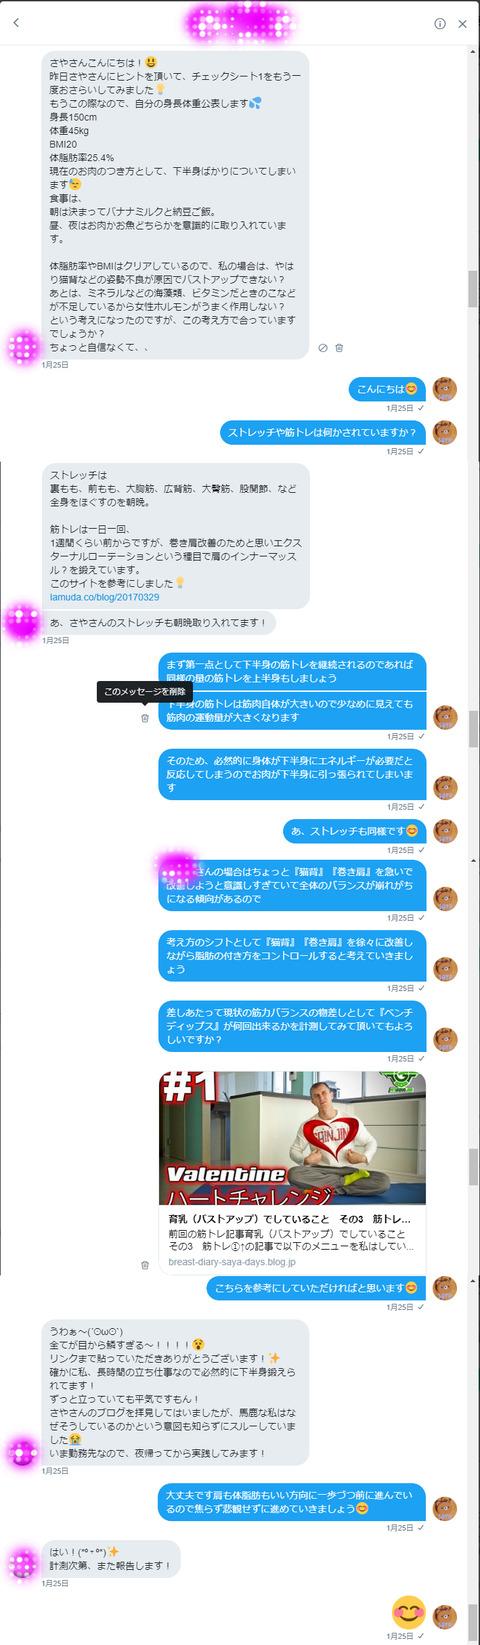 20190130_01